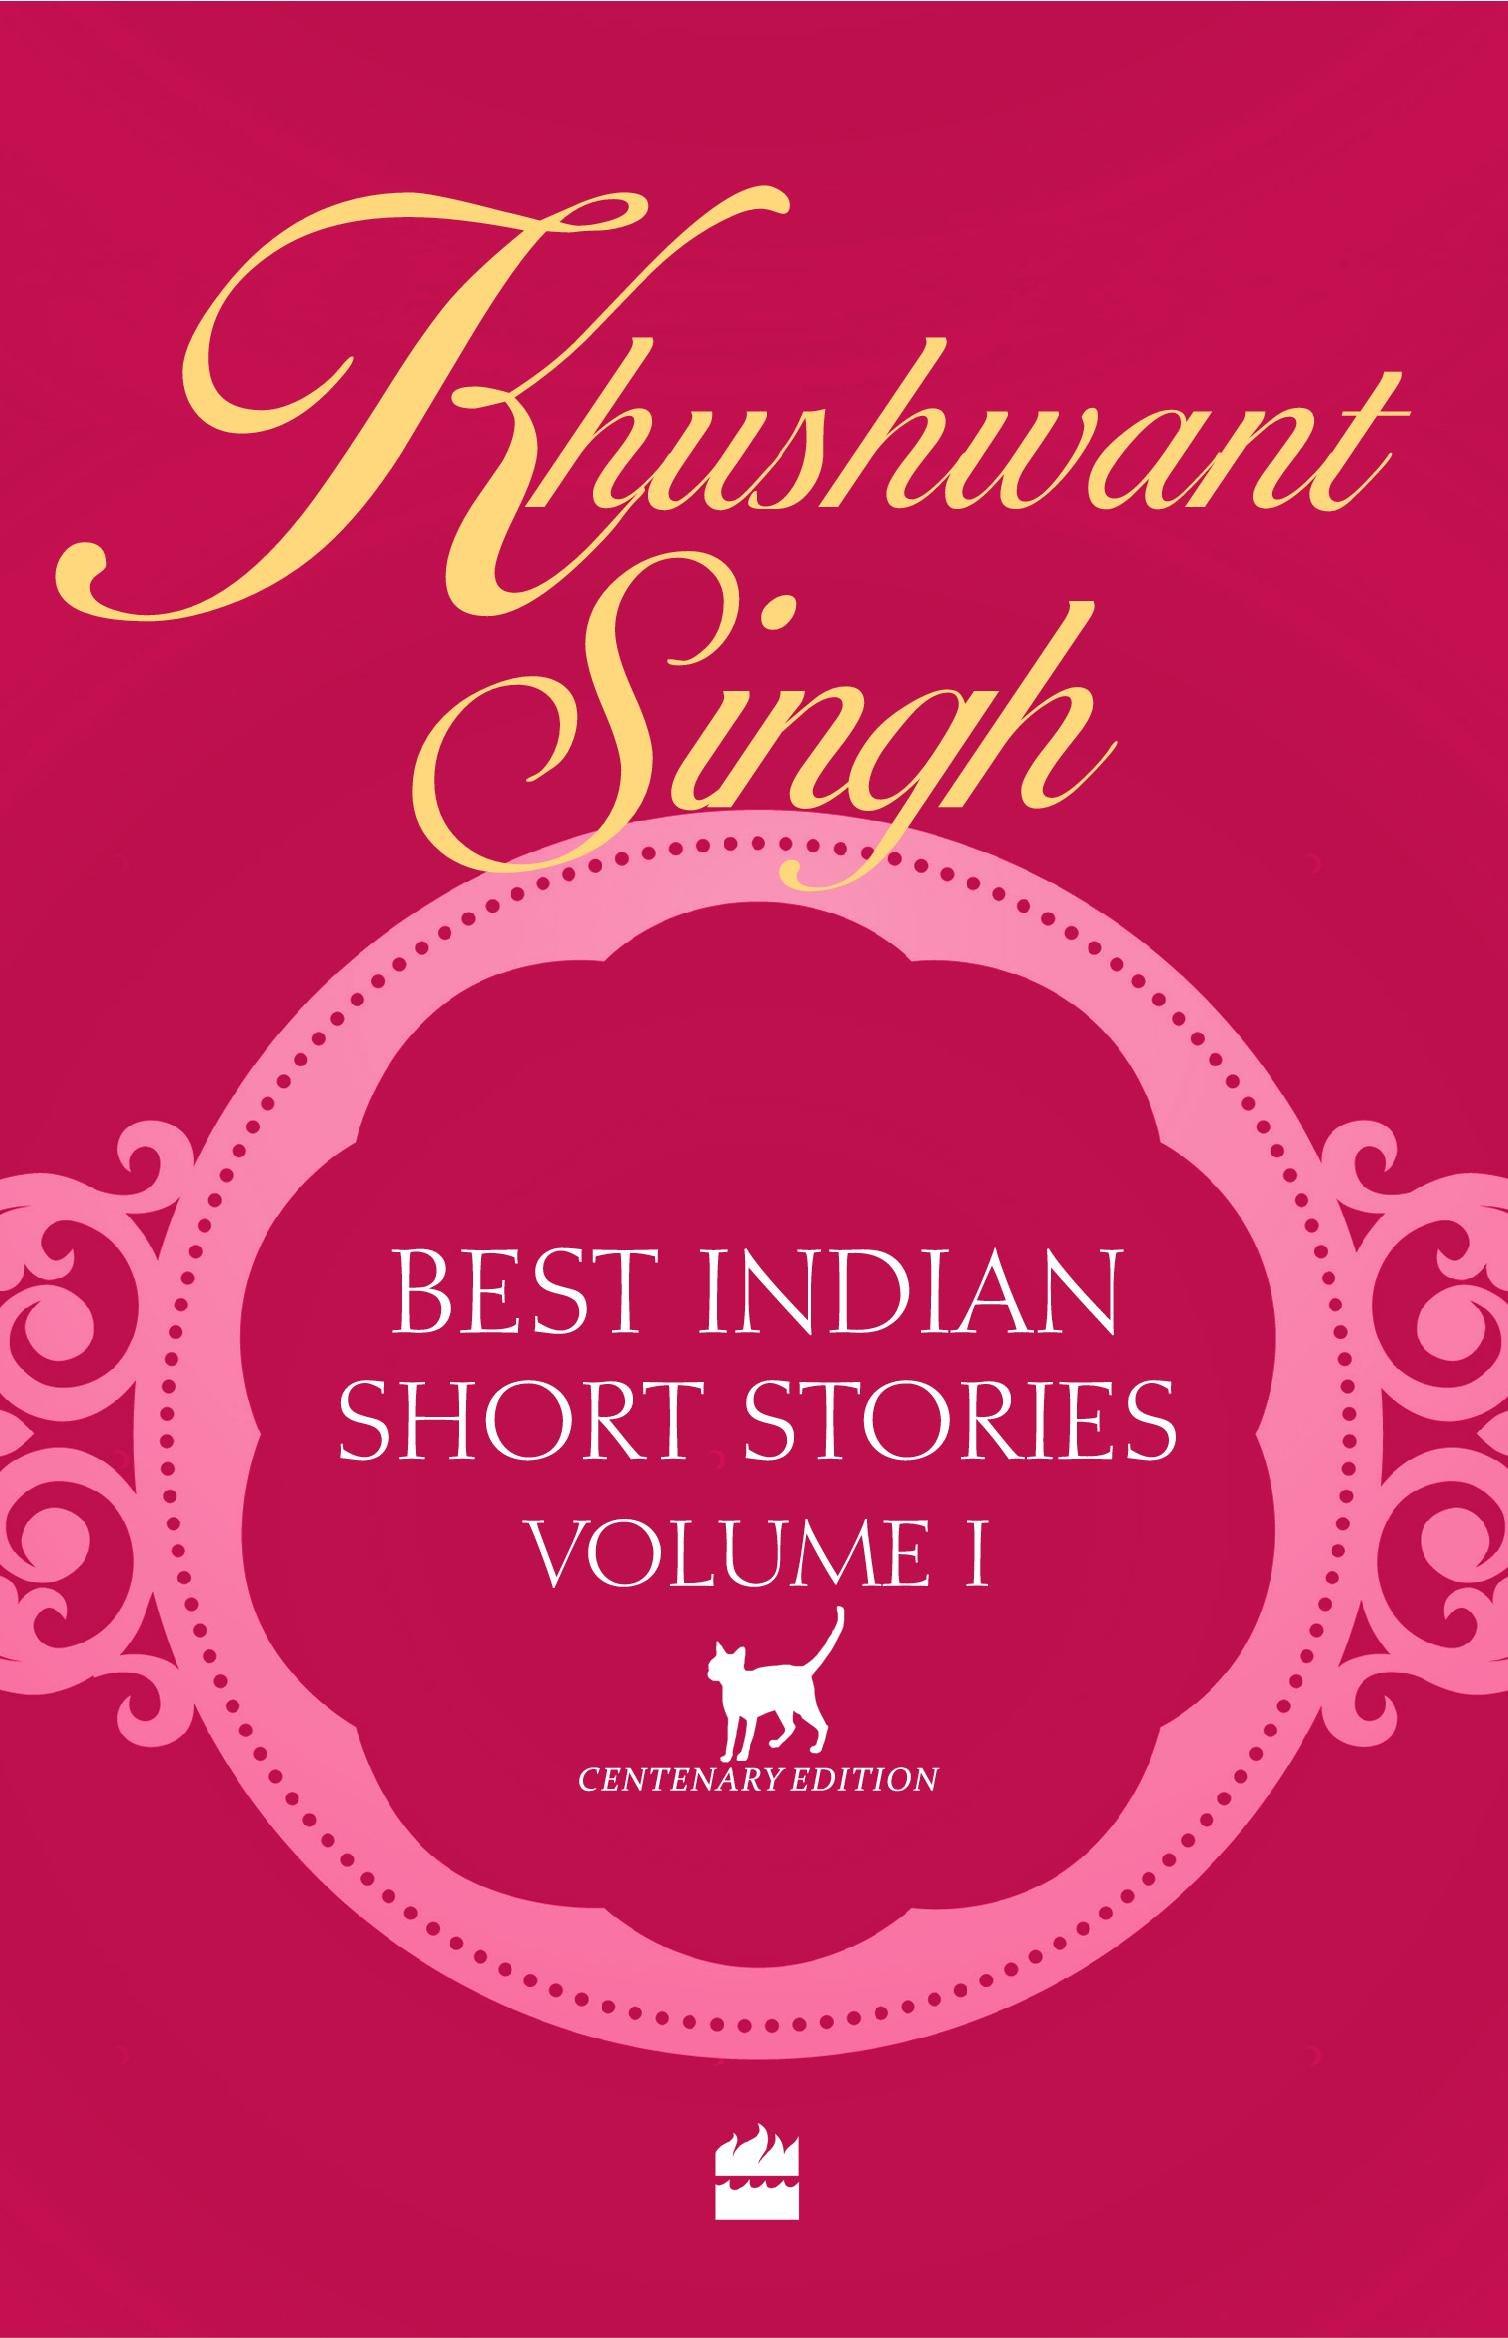 Best Indian Short Stories vol 1